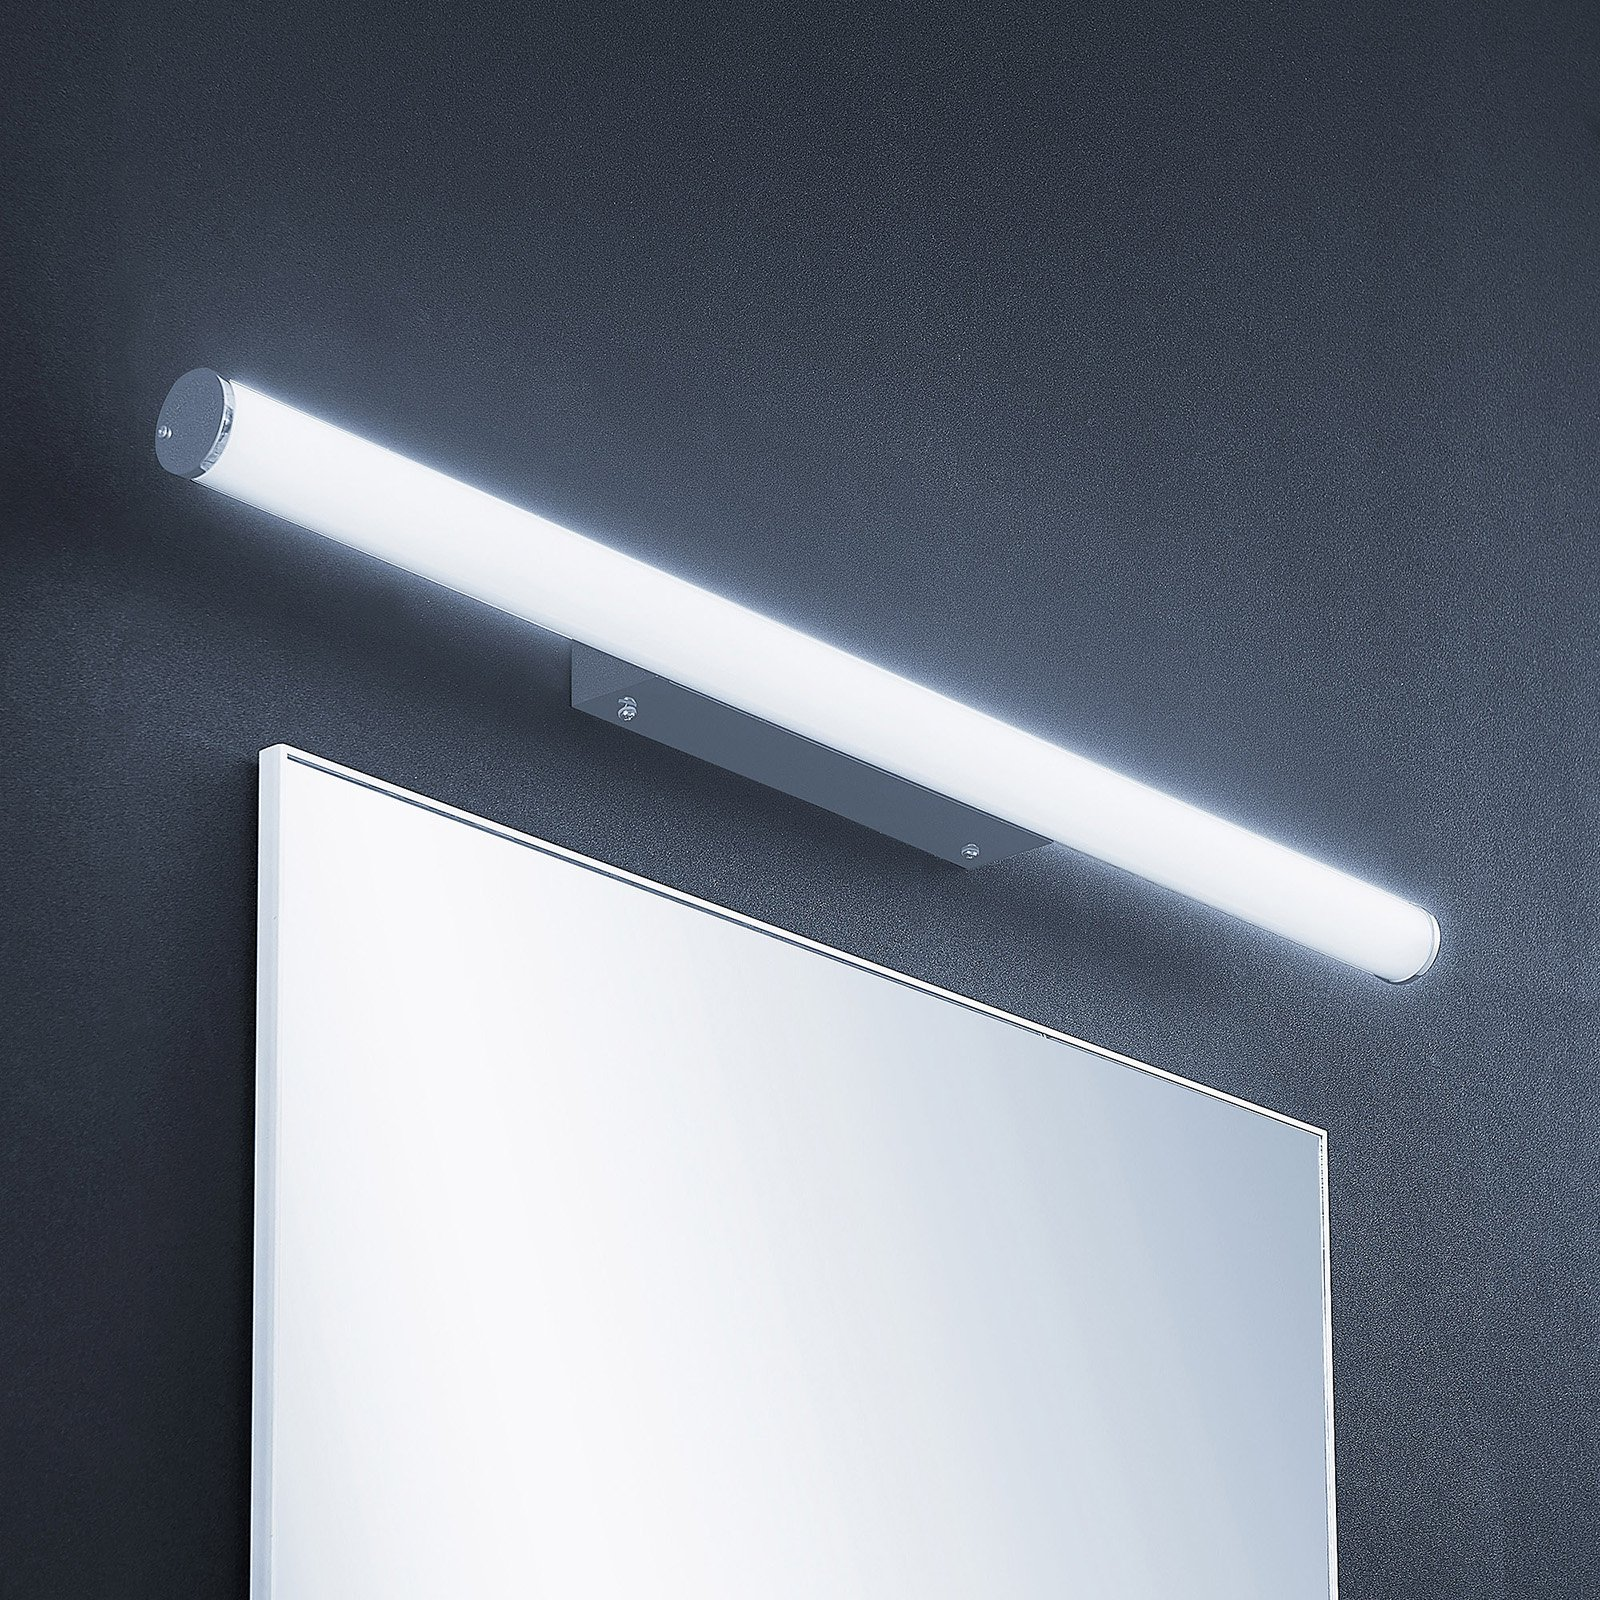 Lindby Sanbi LED-speillampe, 90 cm